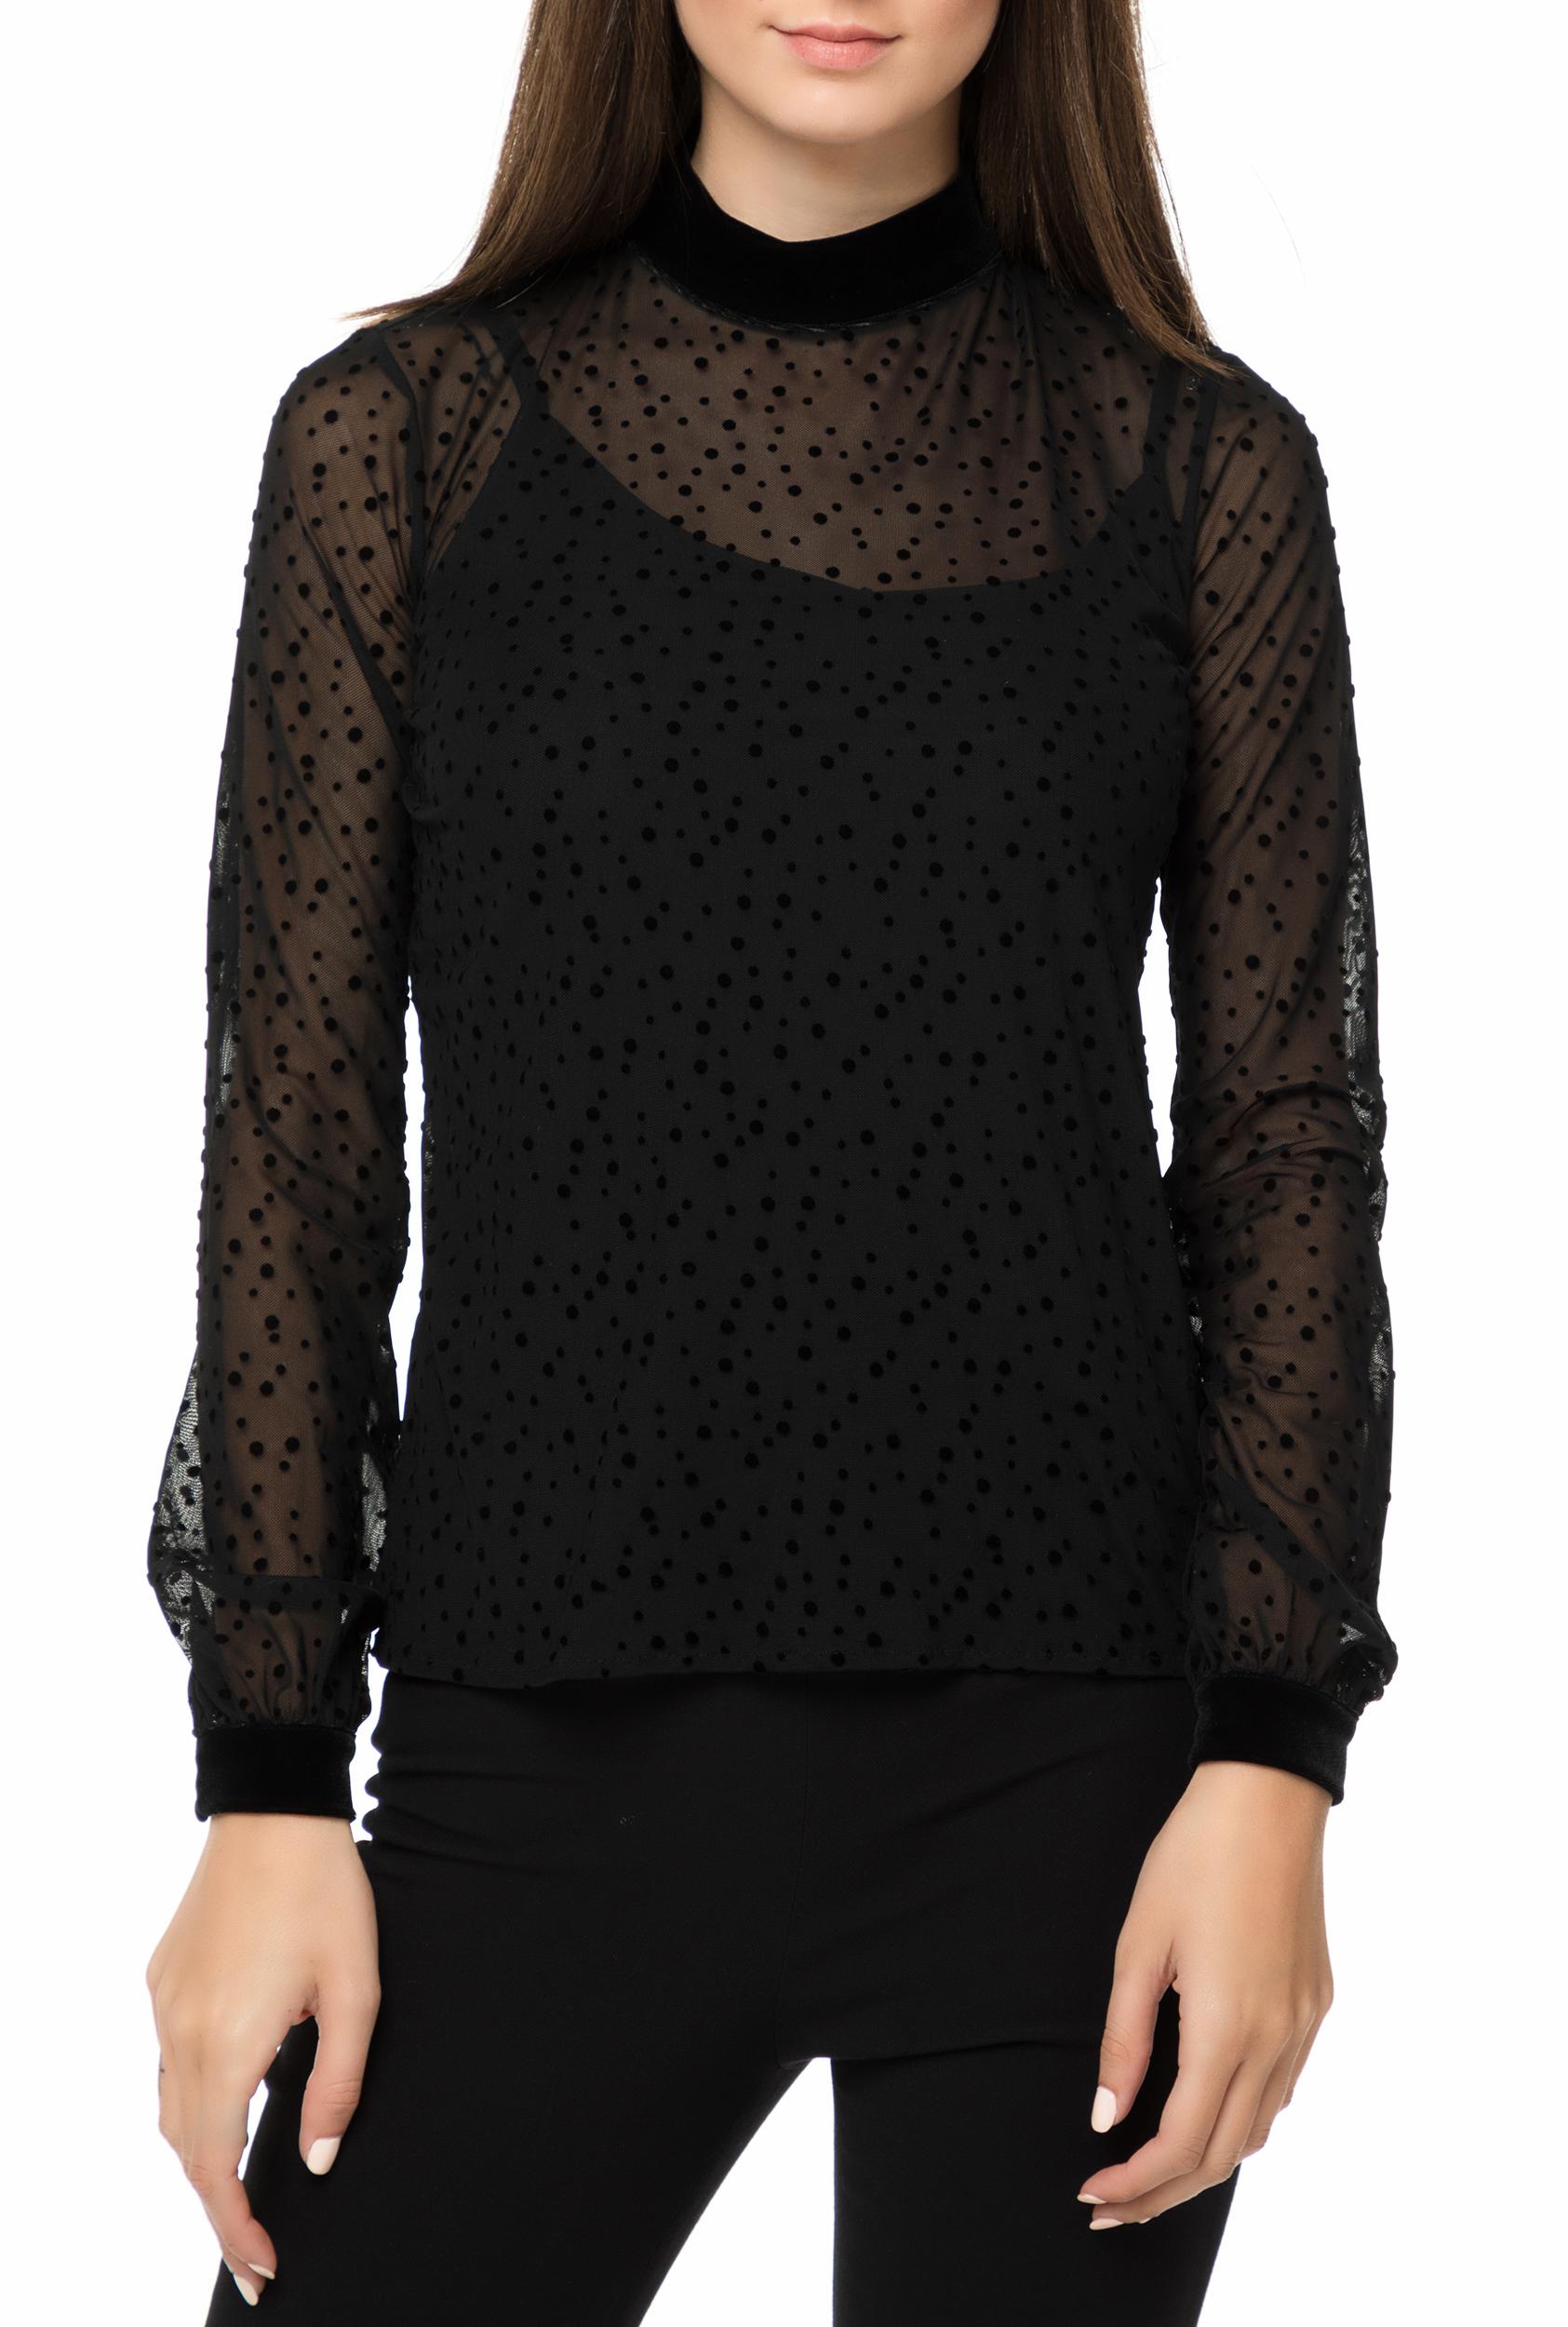 e9dd17c094db GUESS - Γυναικεία μακρυμάνικη μπλούζα με ημιδιαφάνεια GUESS AIDA μαύρη